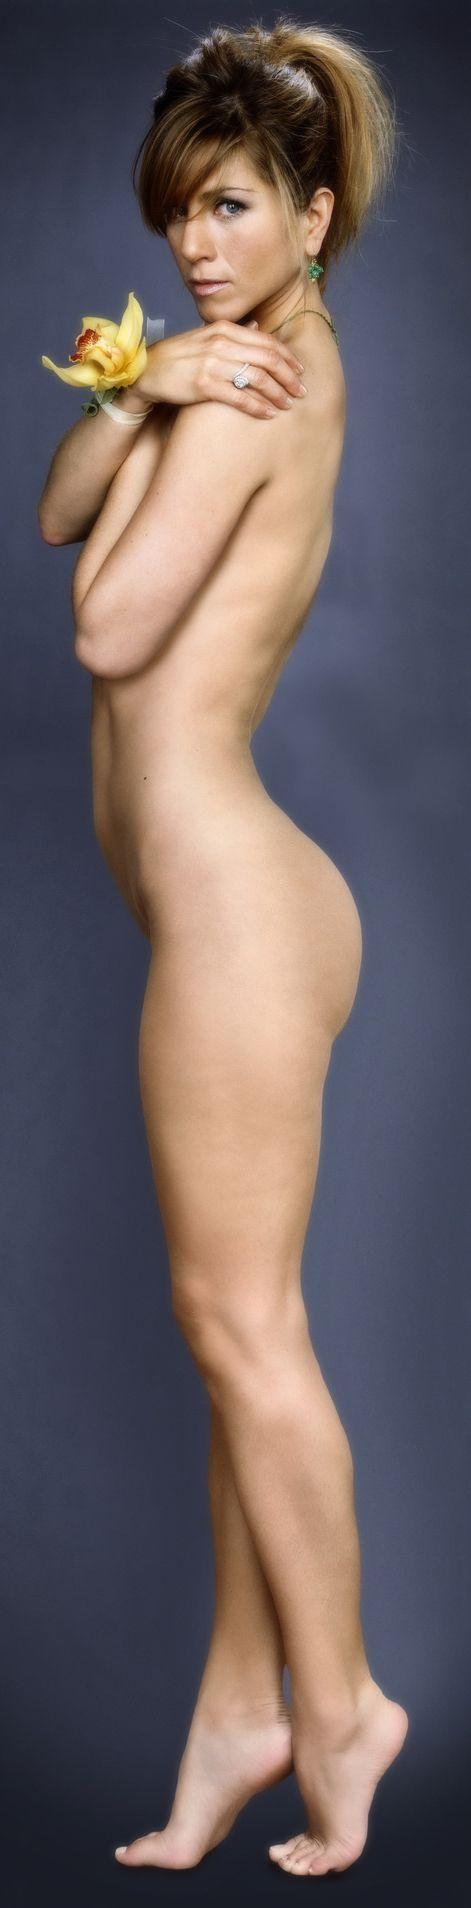 Nude aniston body jennifer